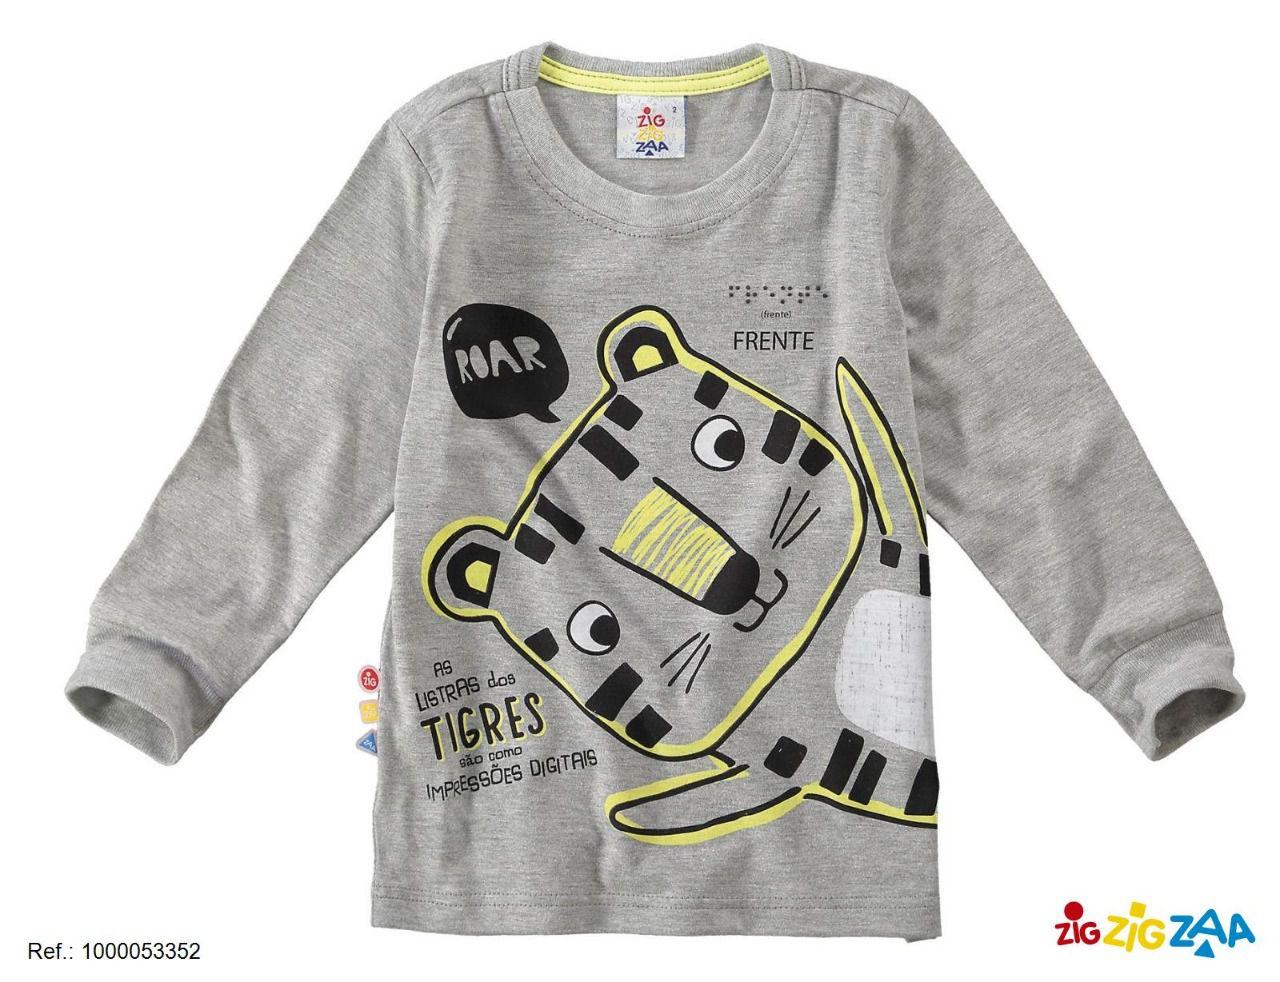 Camisa Manga Longa Tigrinho (Matheus)